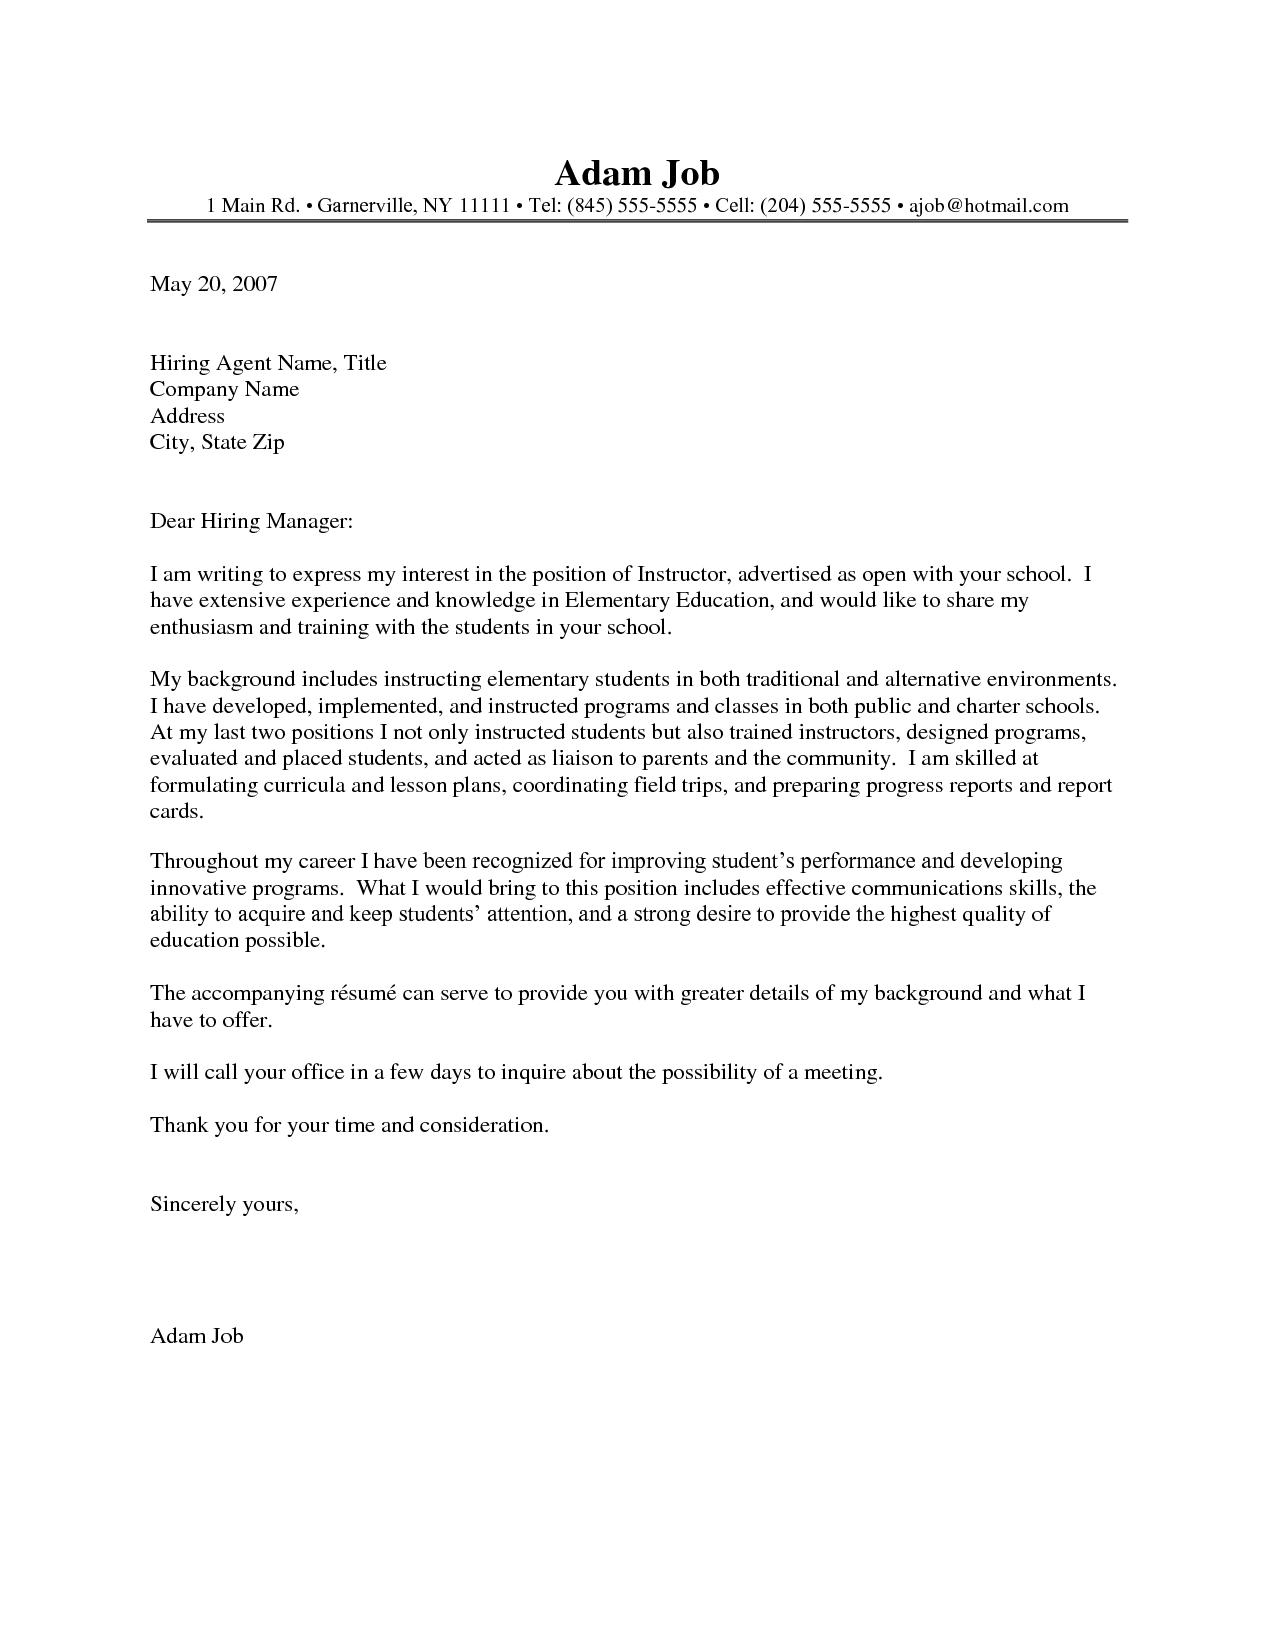 Cover Letter Template For Teachers - Resume Examples